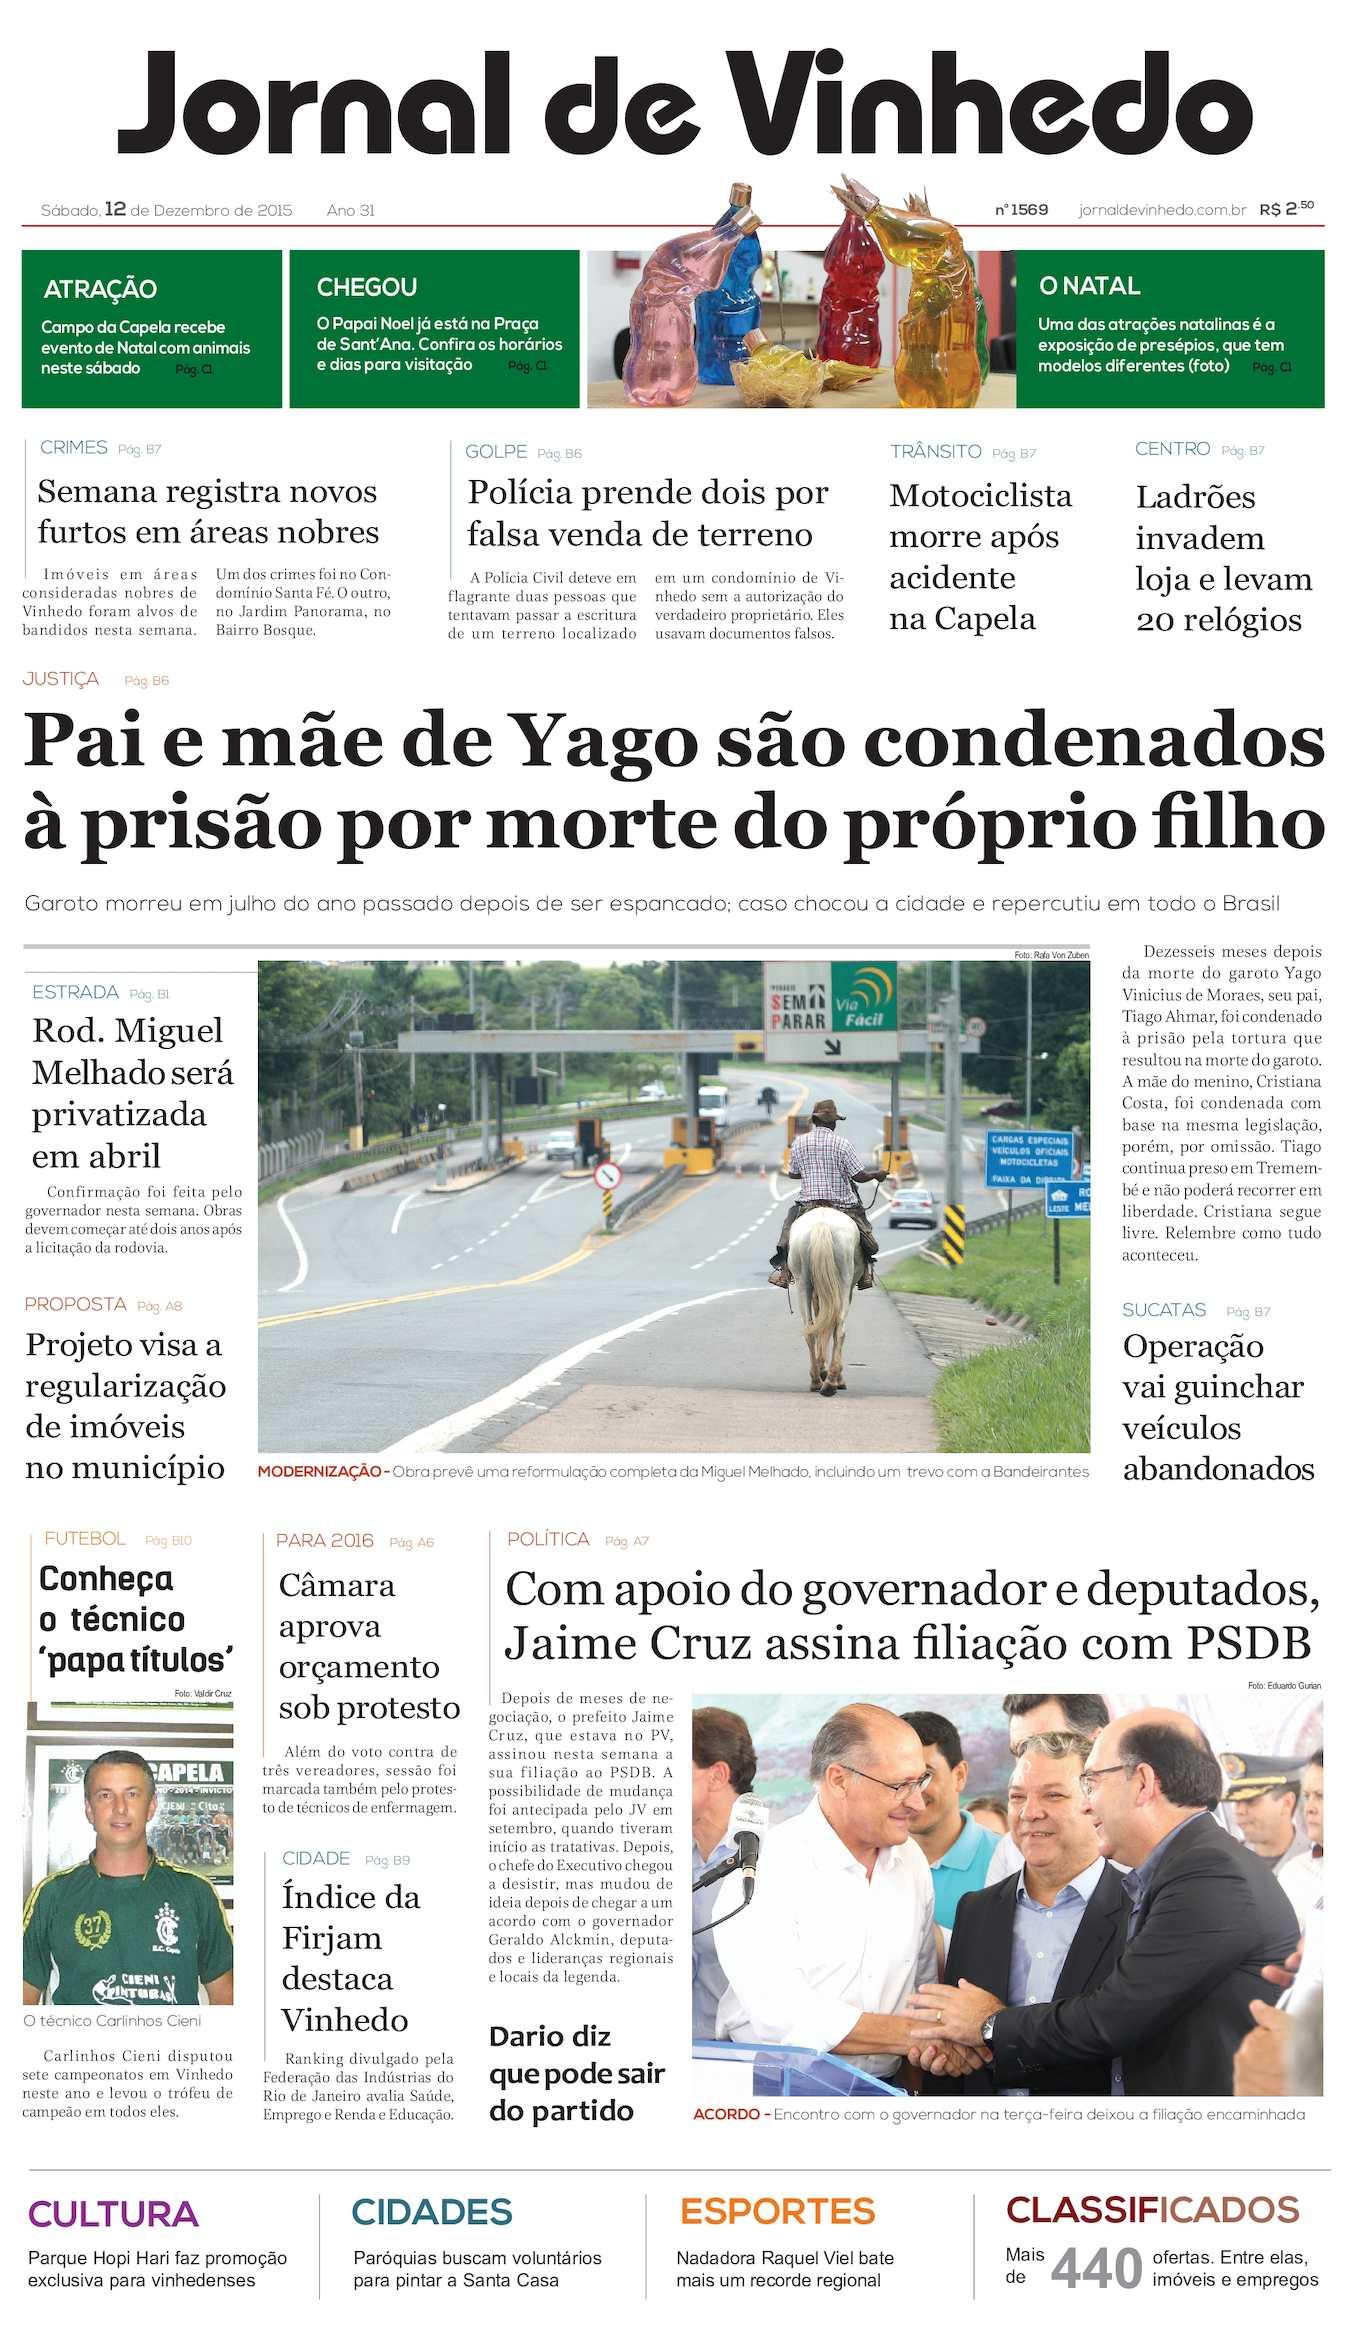 Calaméo - Jornal De Vinhedo Sábado 12 De Desembro De 2015 Edic 1569 Ok 03a34b68d0